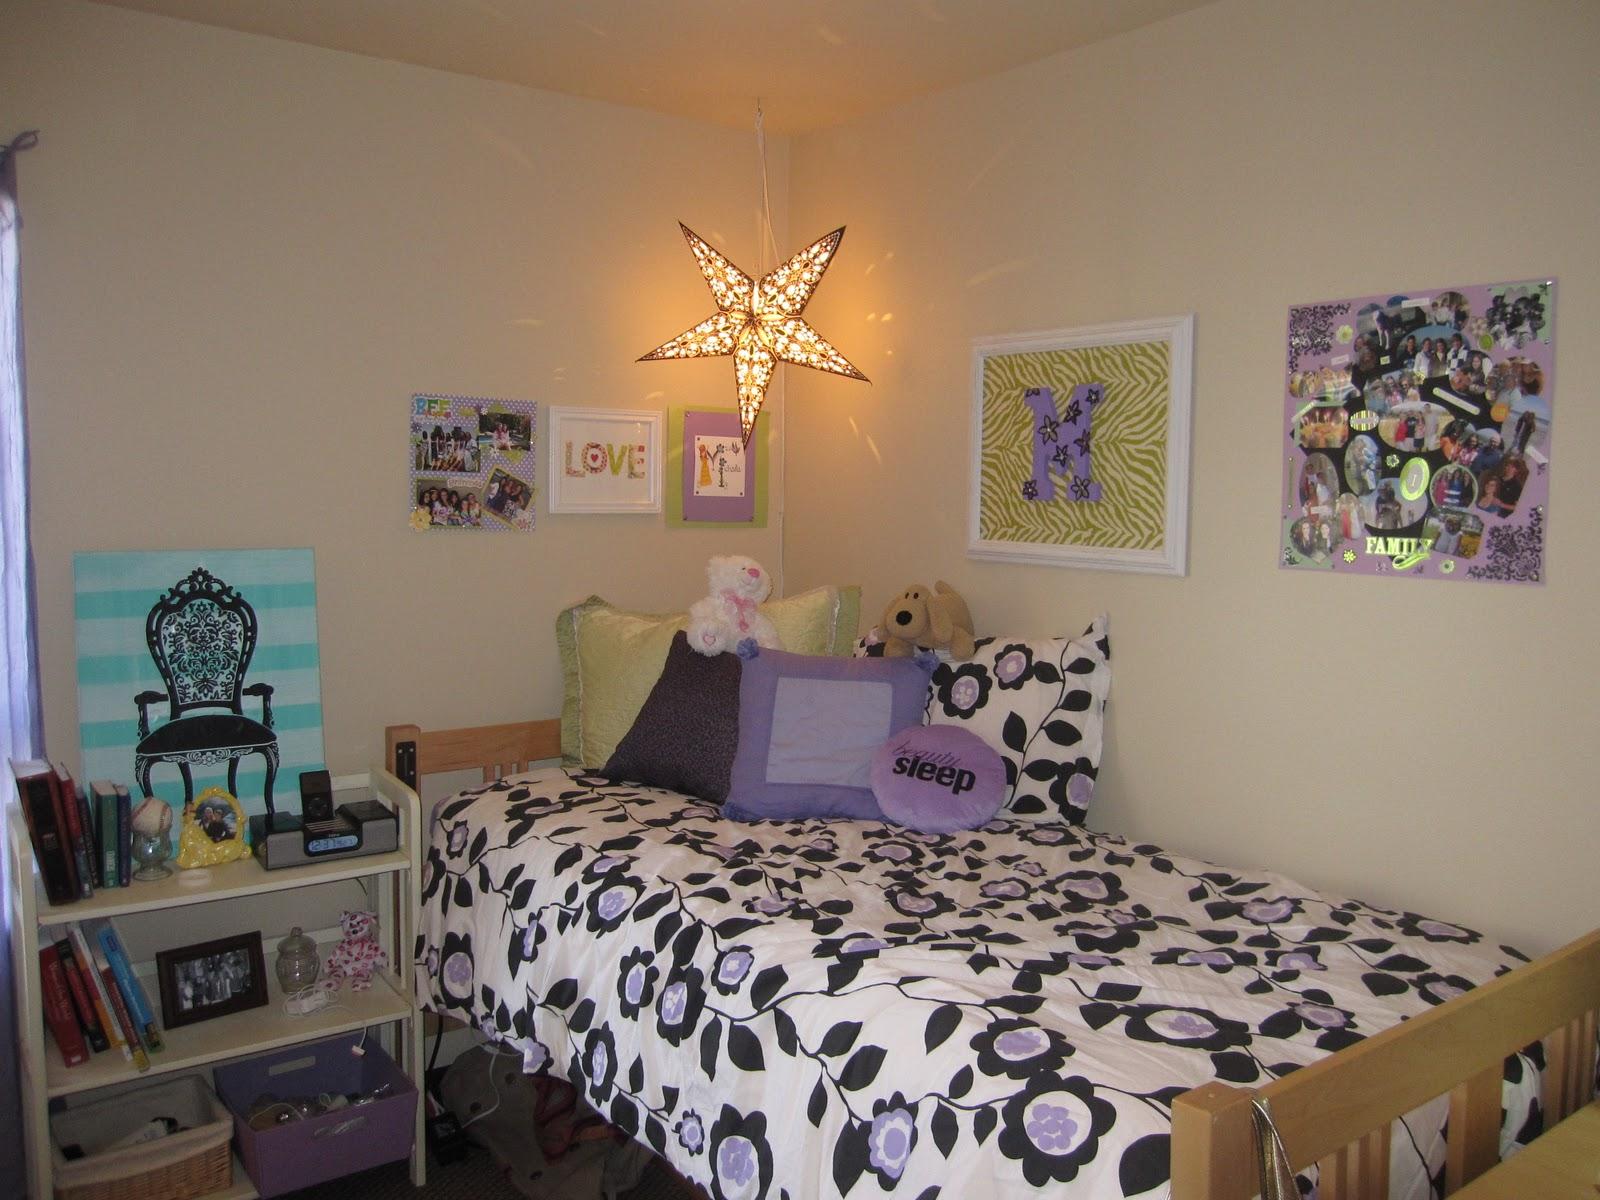 My New Room    Michaela Noelle Designs. Finally   My New Room    Michaela Noelle Designs